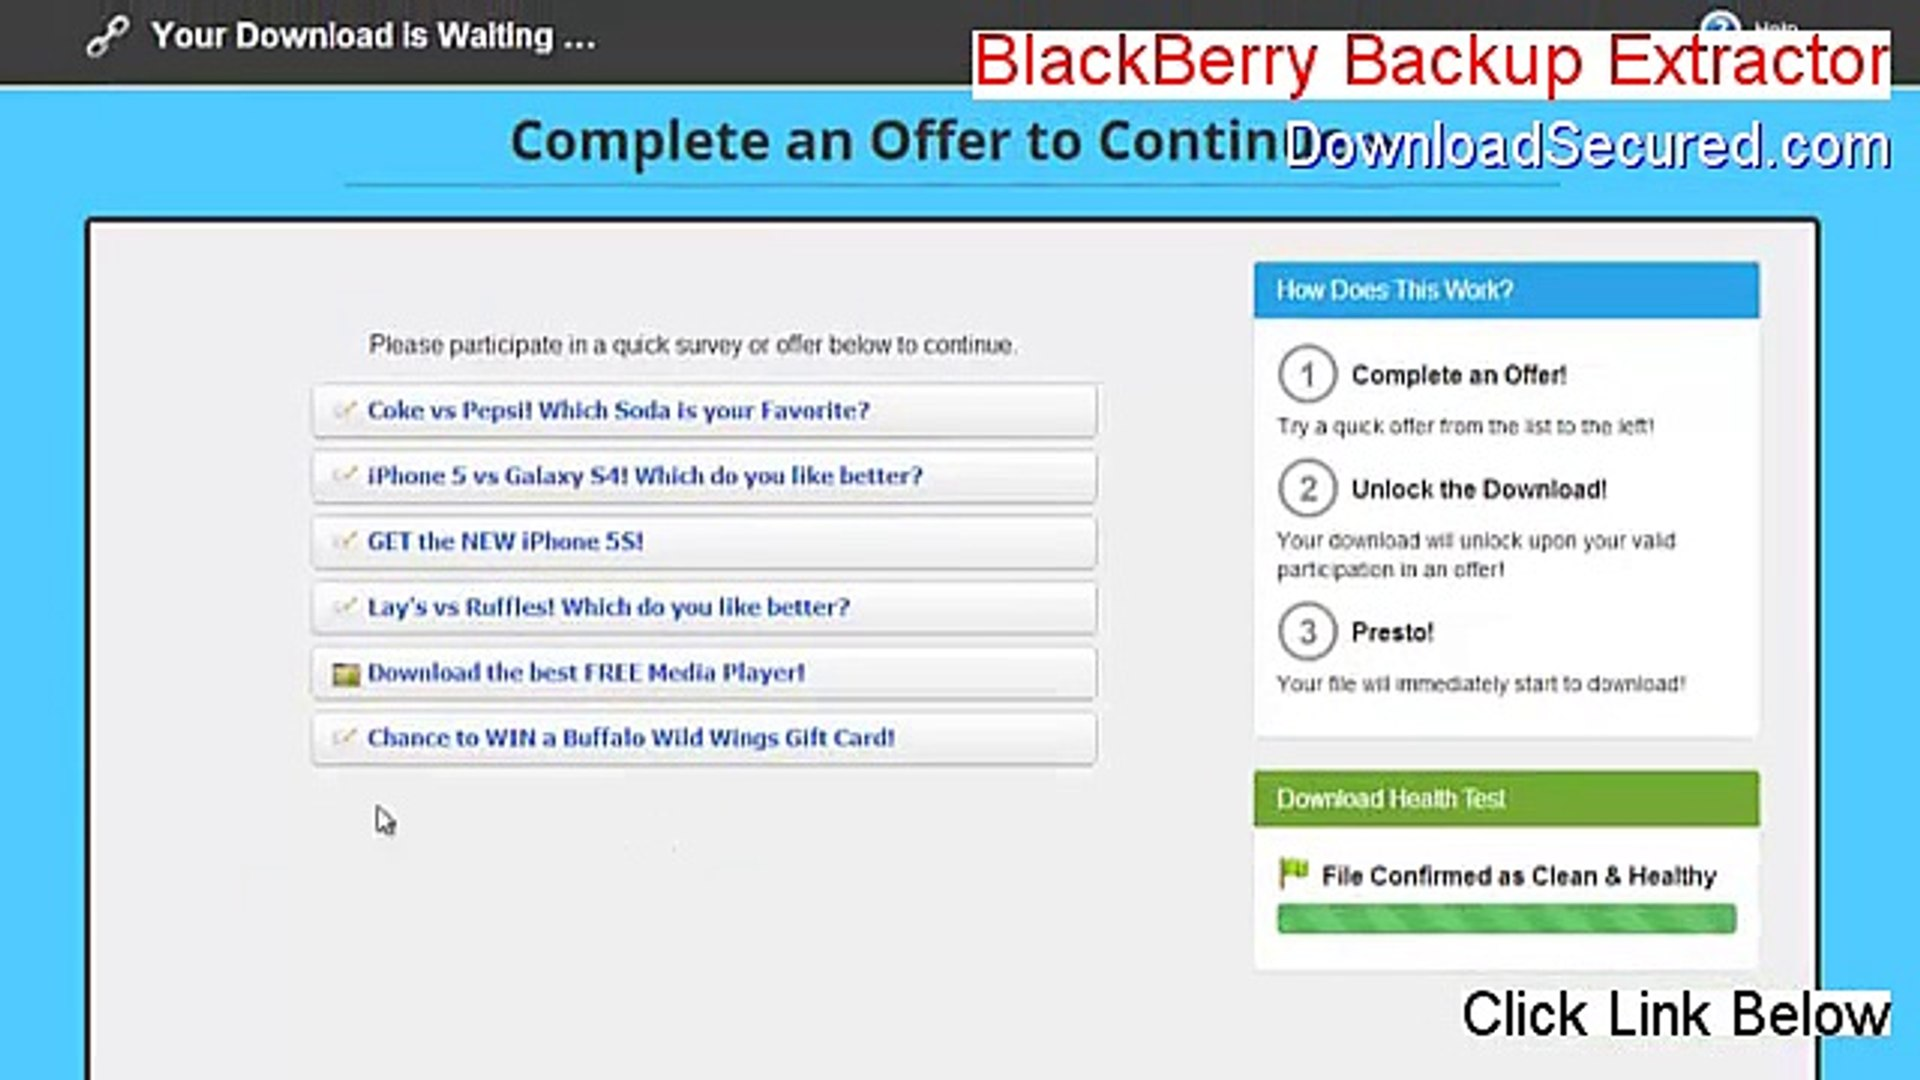 Serial number blackberry backup extractor - serial number blackberry backup extractor free